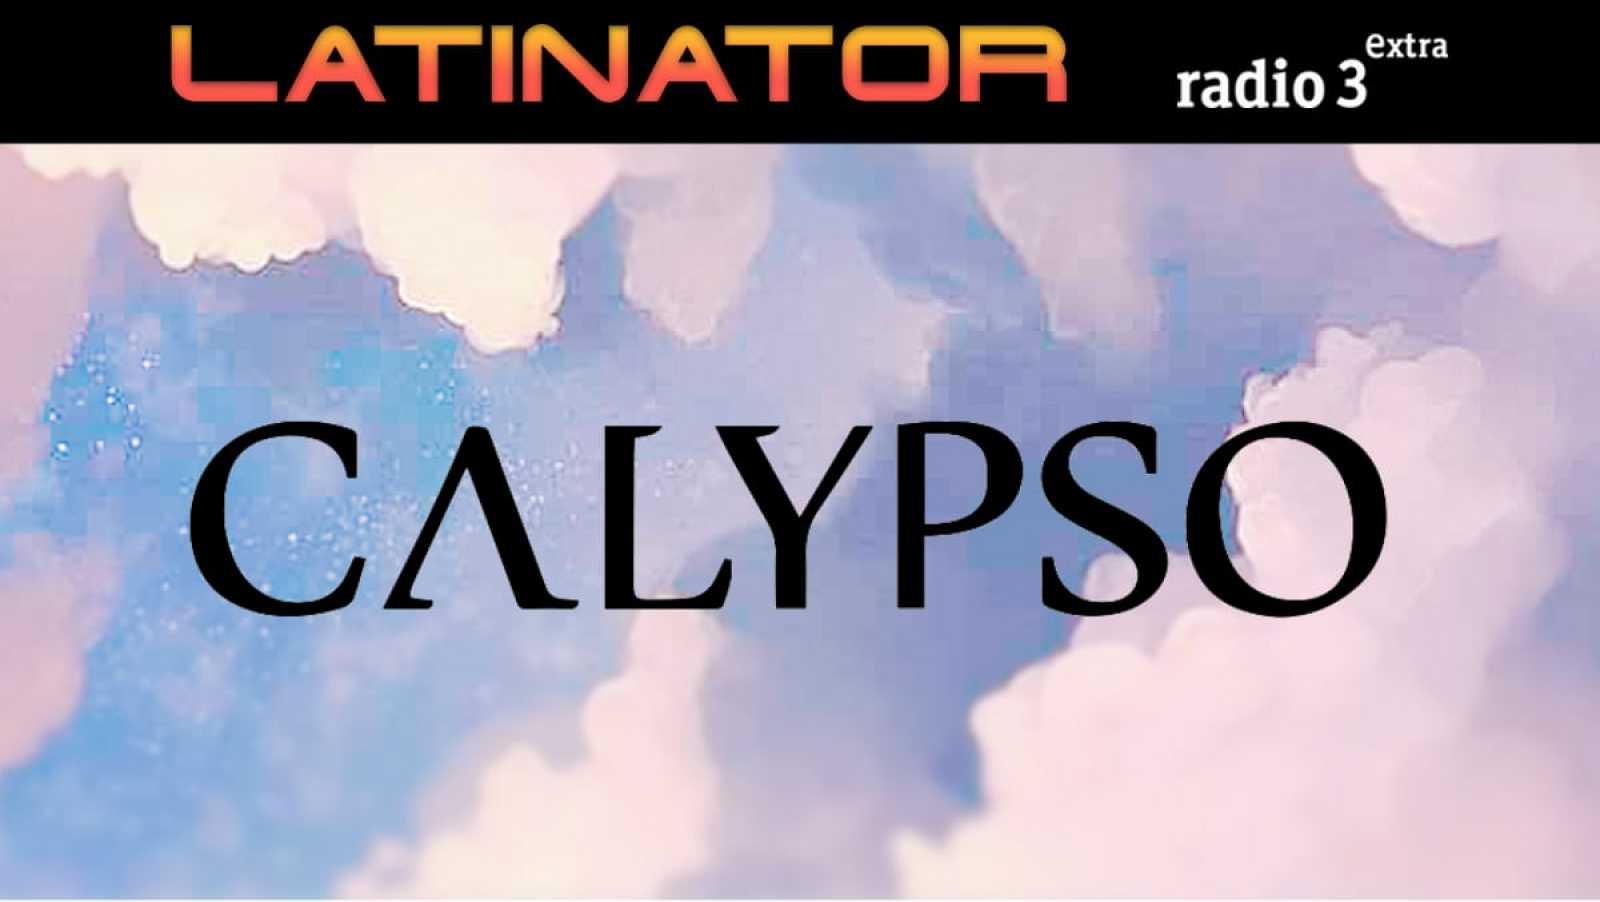 Latinator - CALYPSO RECORDS - 18/06/20 - escuchar ahora